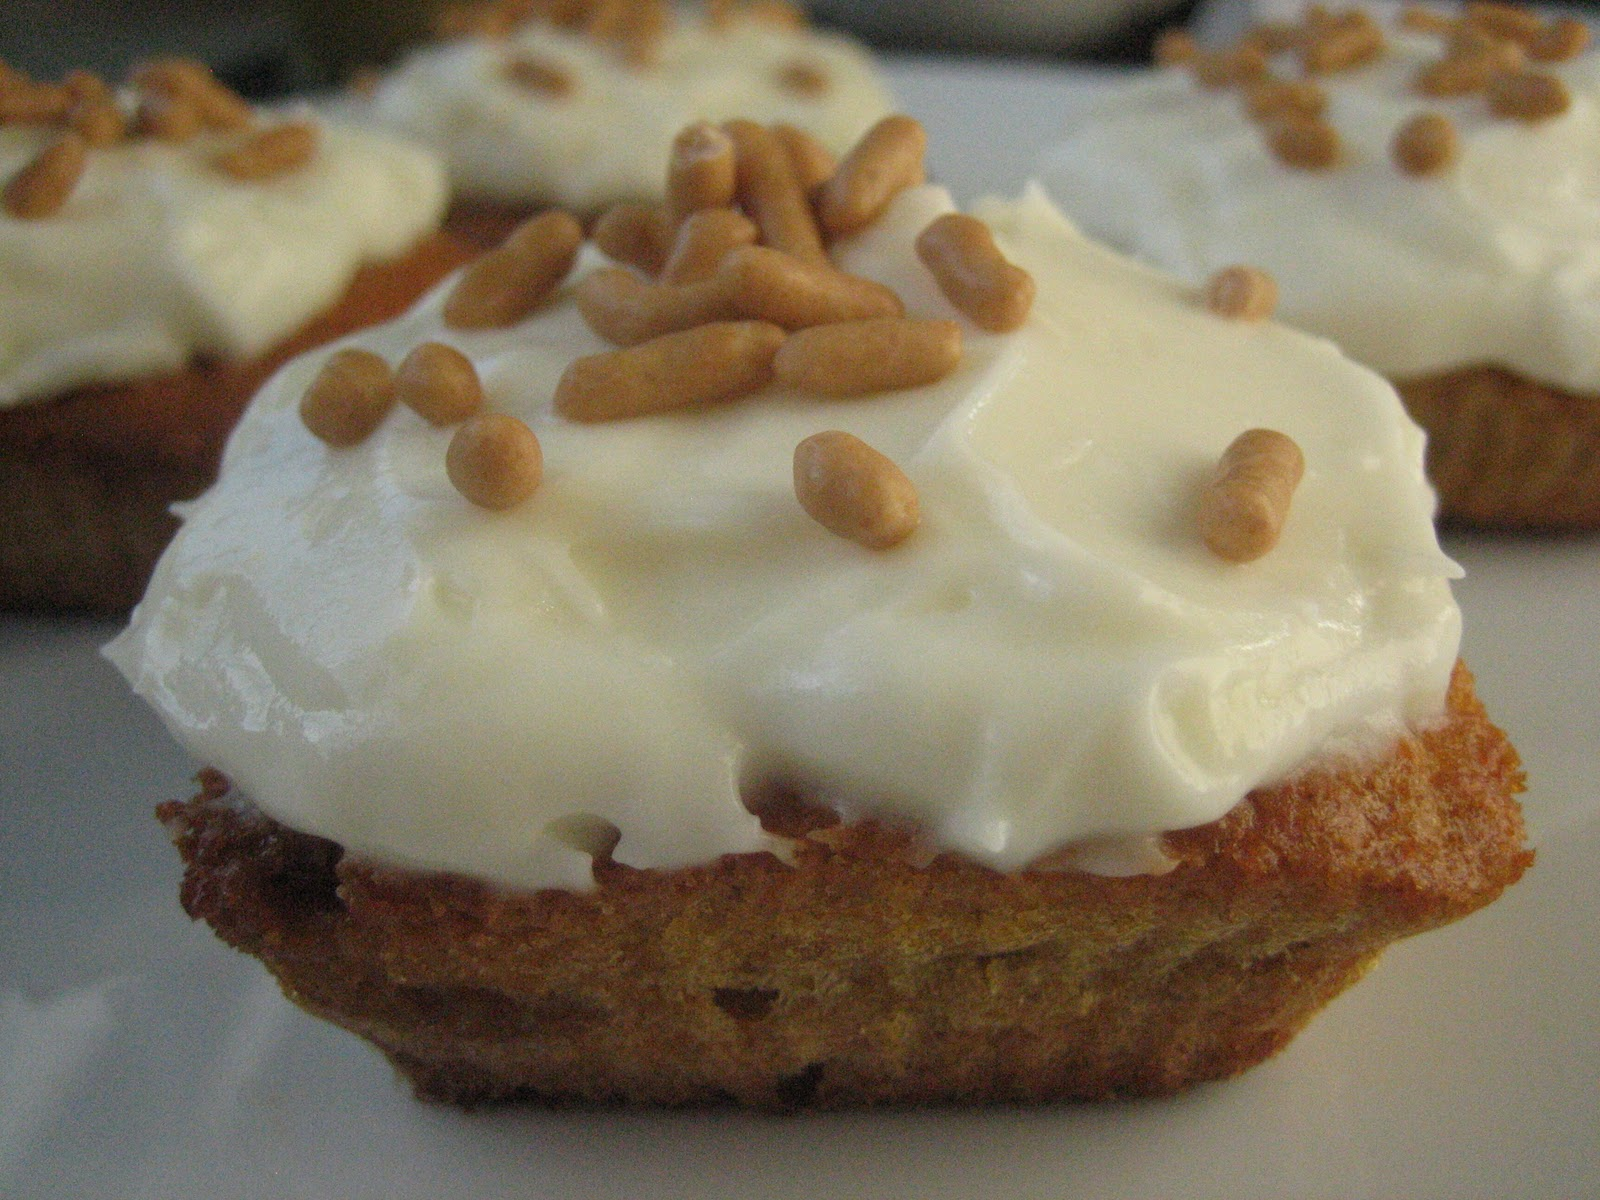 ... Vigo: Cupcakes de zanahoria (Carrot Cupcakes with mascarpone Frosting